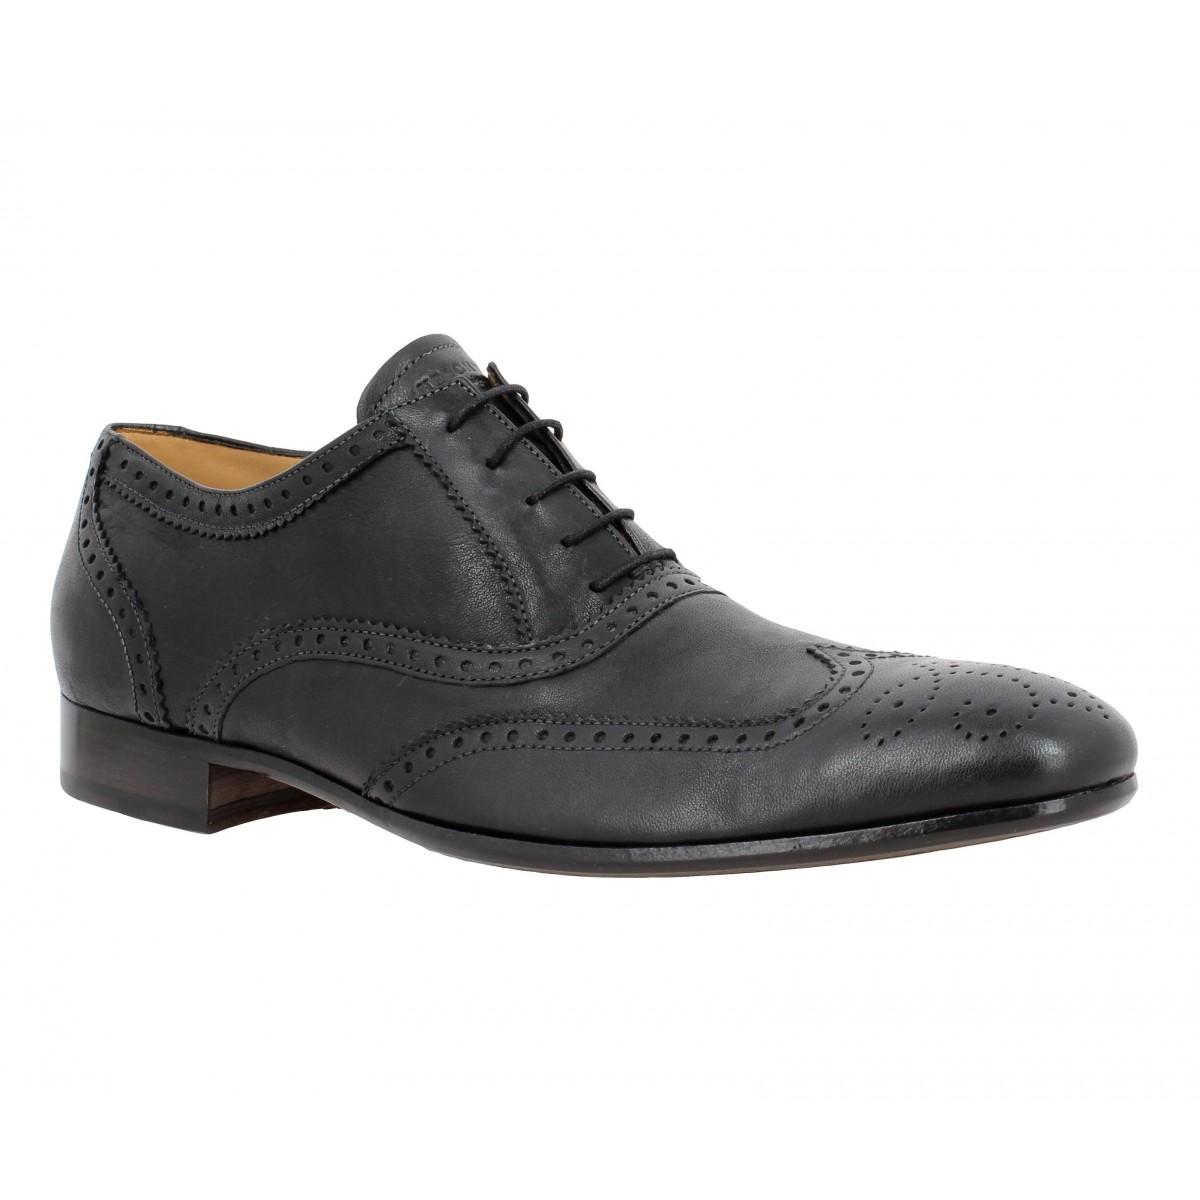 Chaussures à lacets HESCHUNG Dryade Safari cuir Homme Noir